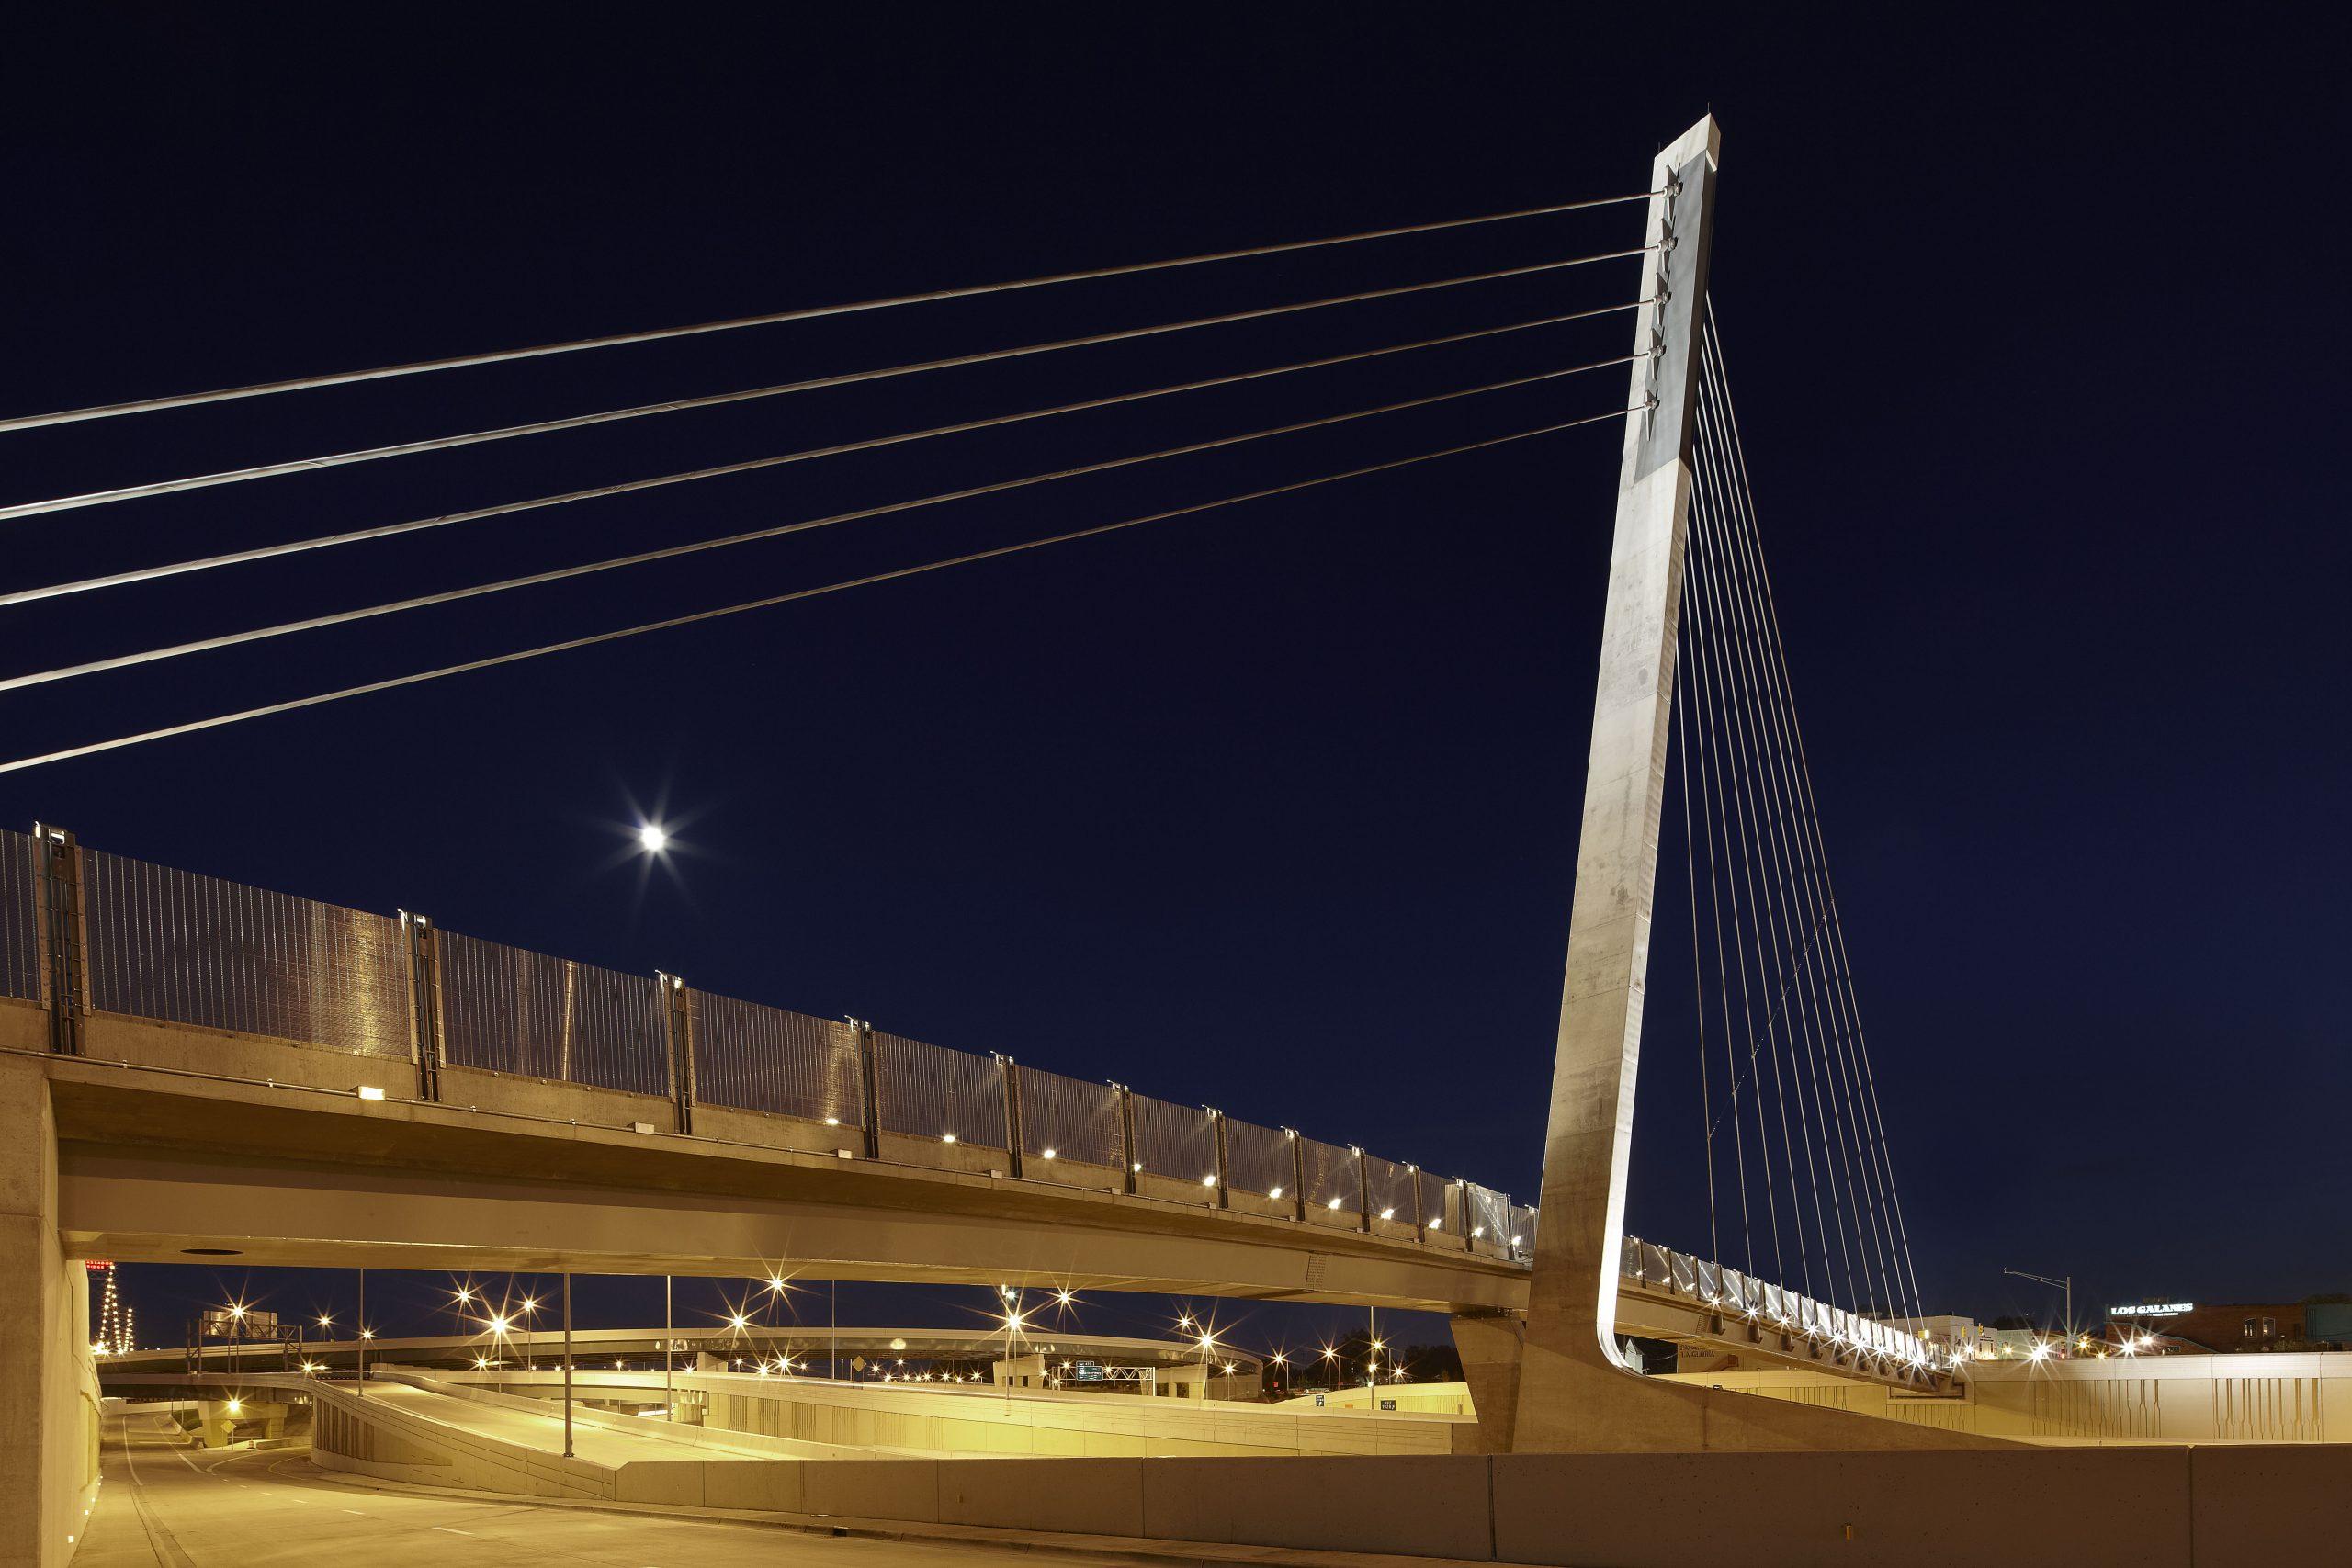 Bagley Pedestrian Bridge